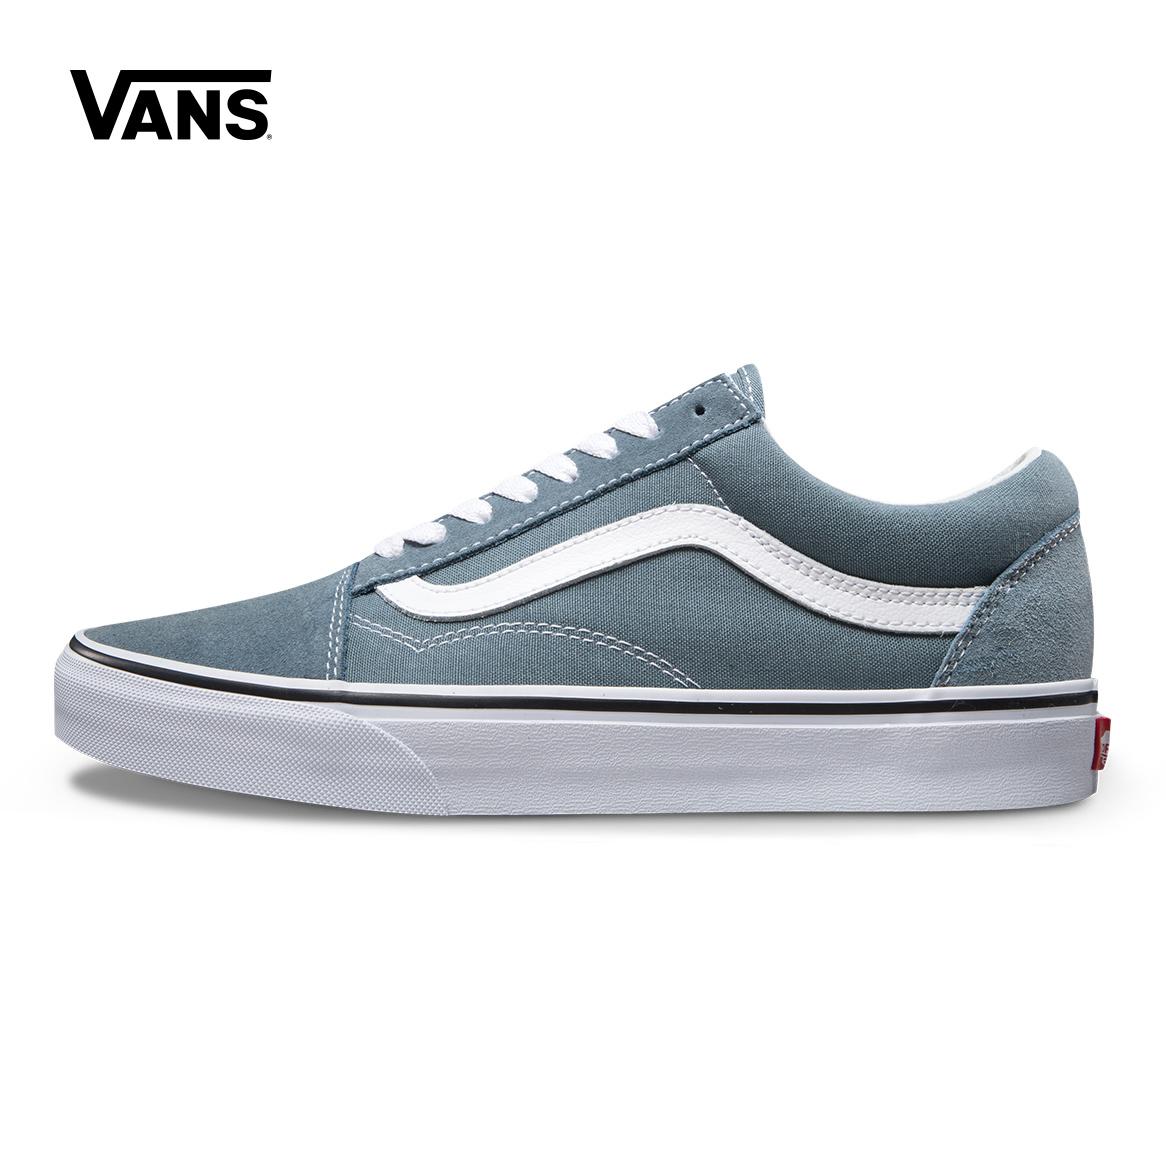 Vans 范斯官方男女款OLD SKOOL板鞋 VN0A38G12LJ